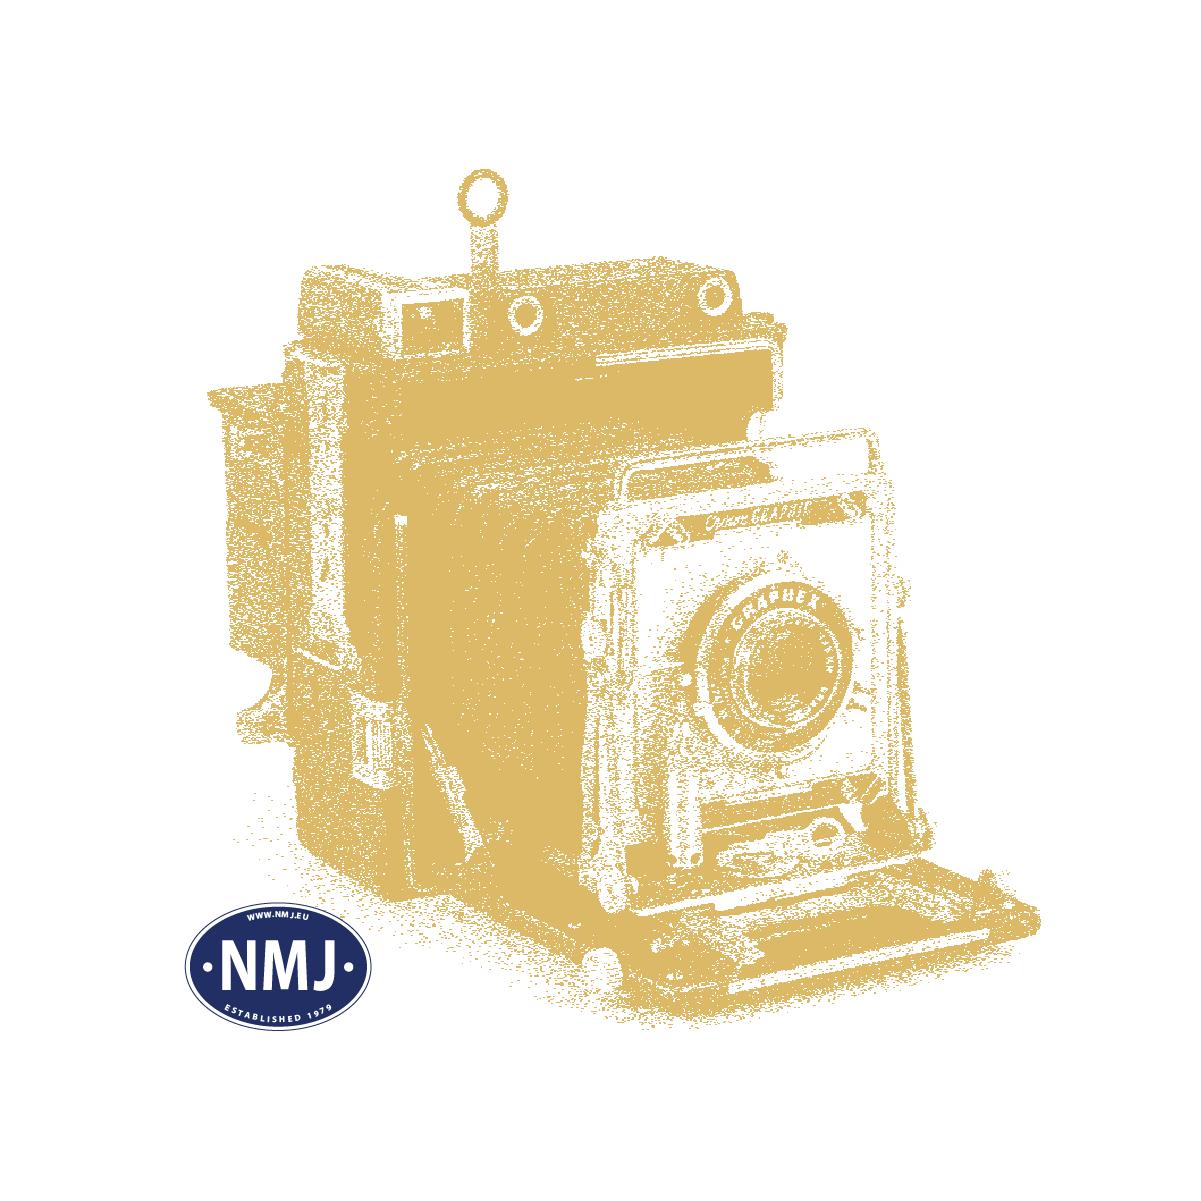 NMJT95404 - NMJ Topline SNCB 5407, AC Digital